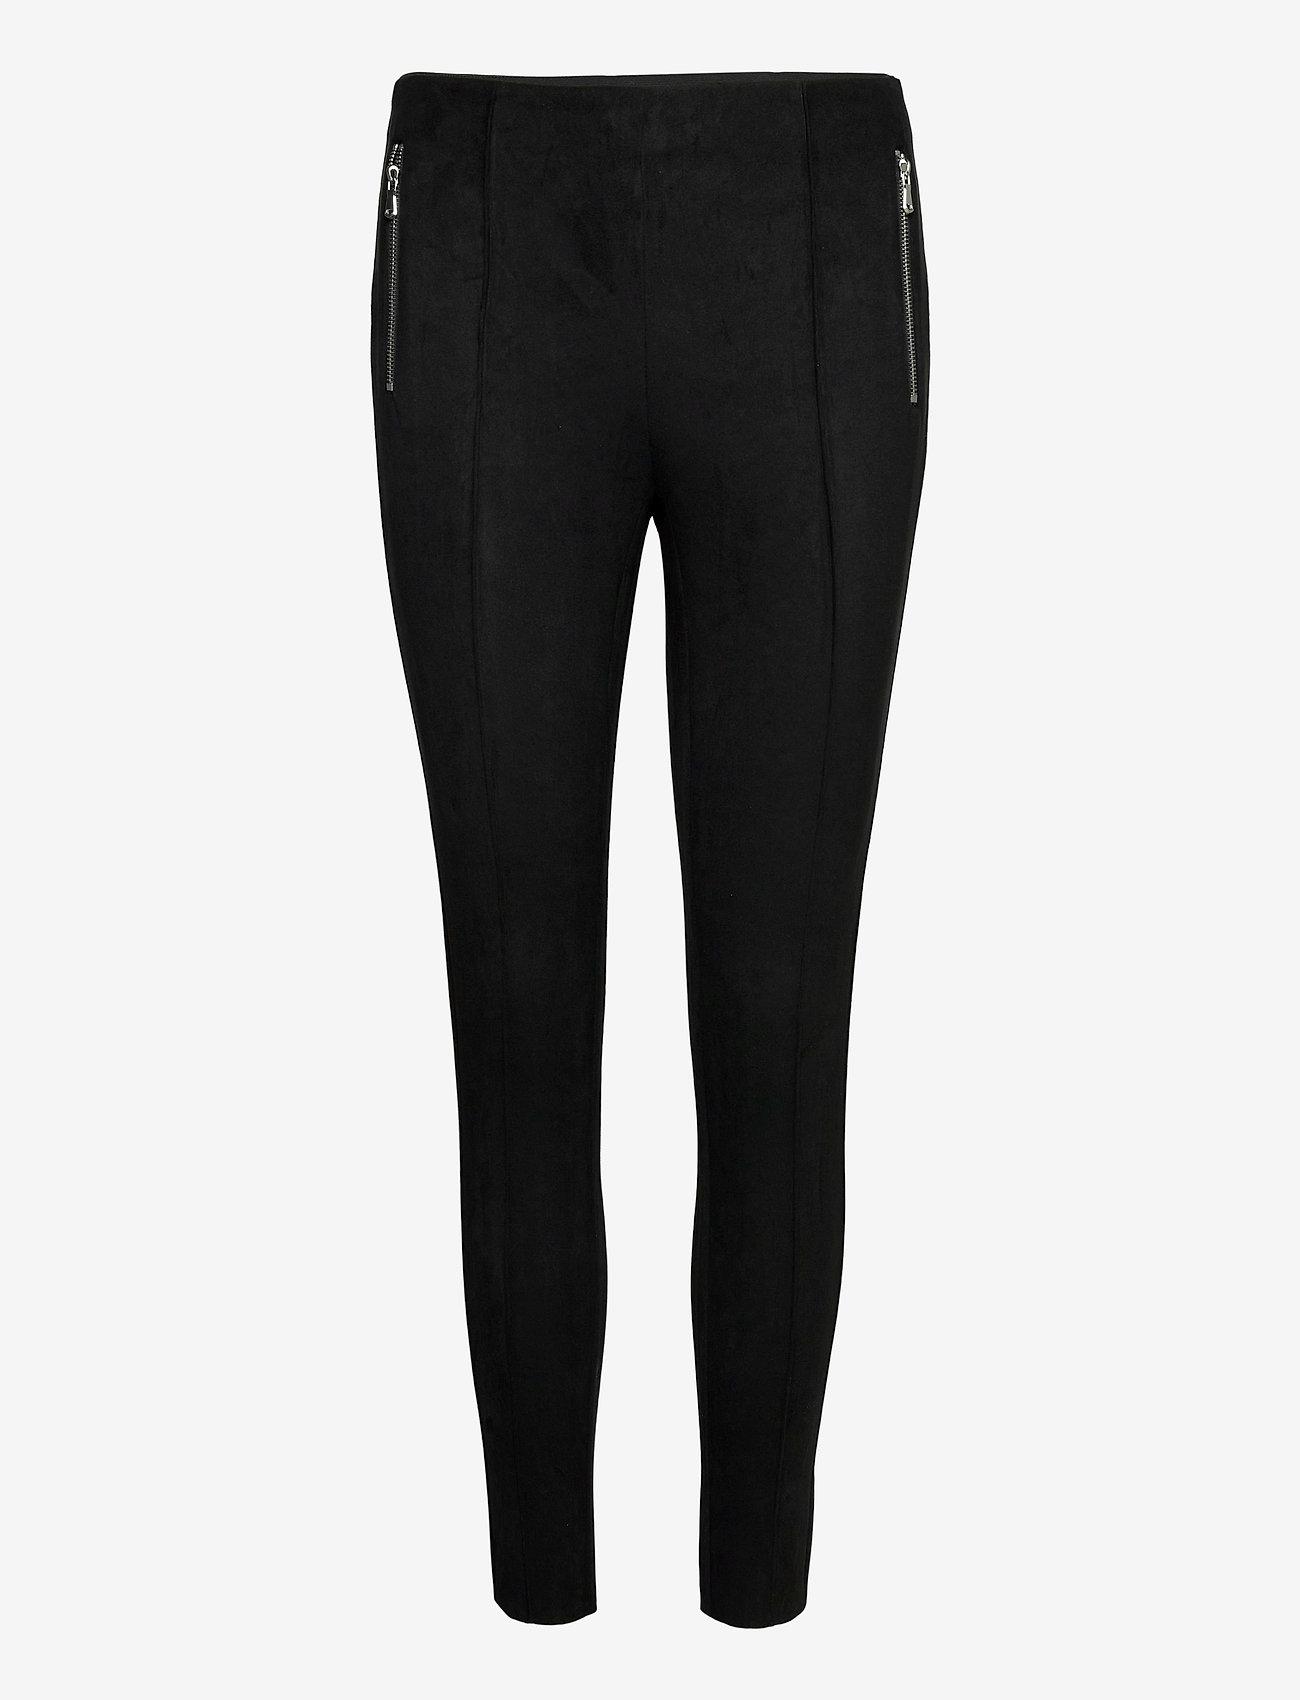 Vero Moda - VMCAVA ZIP NW FAUX SUEDE LEGGING JRS BOO - leggings - black - 0